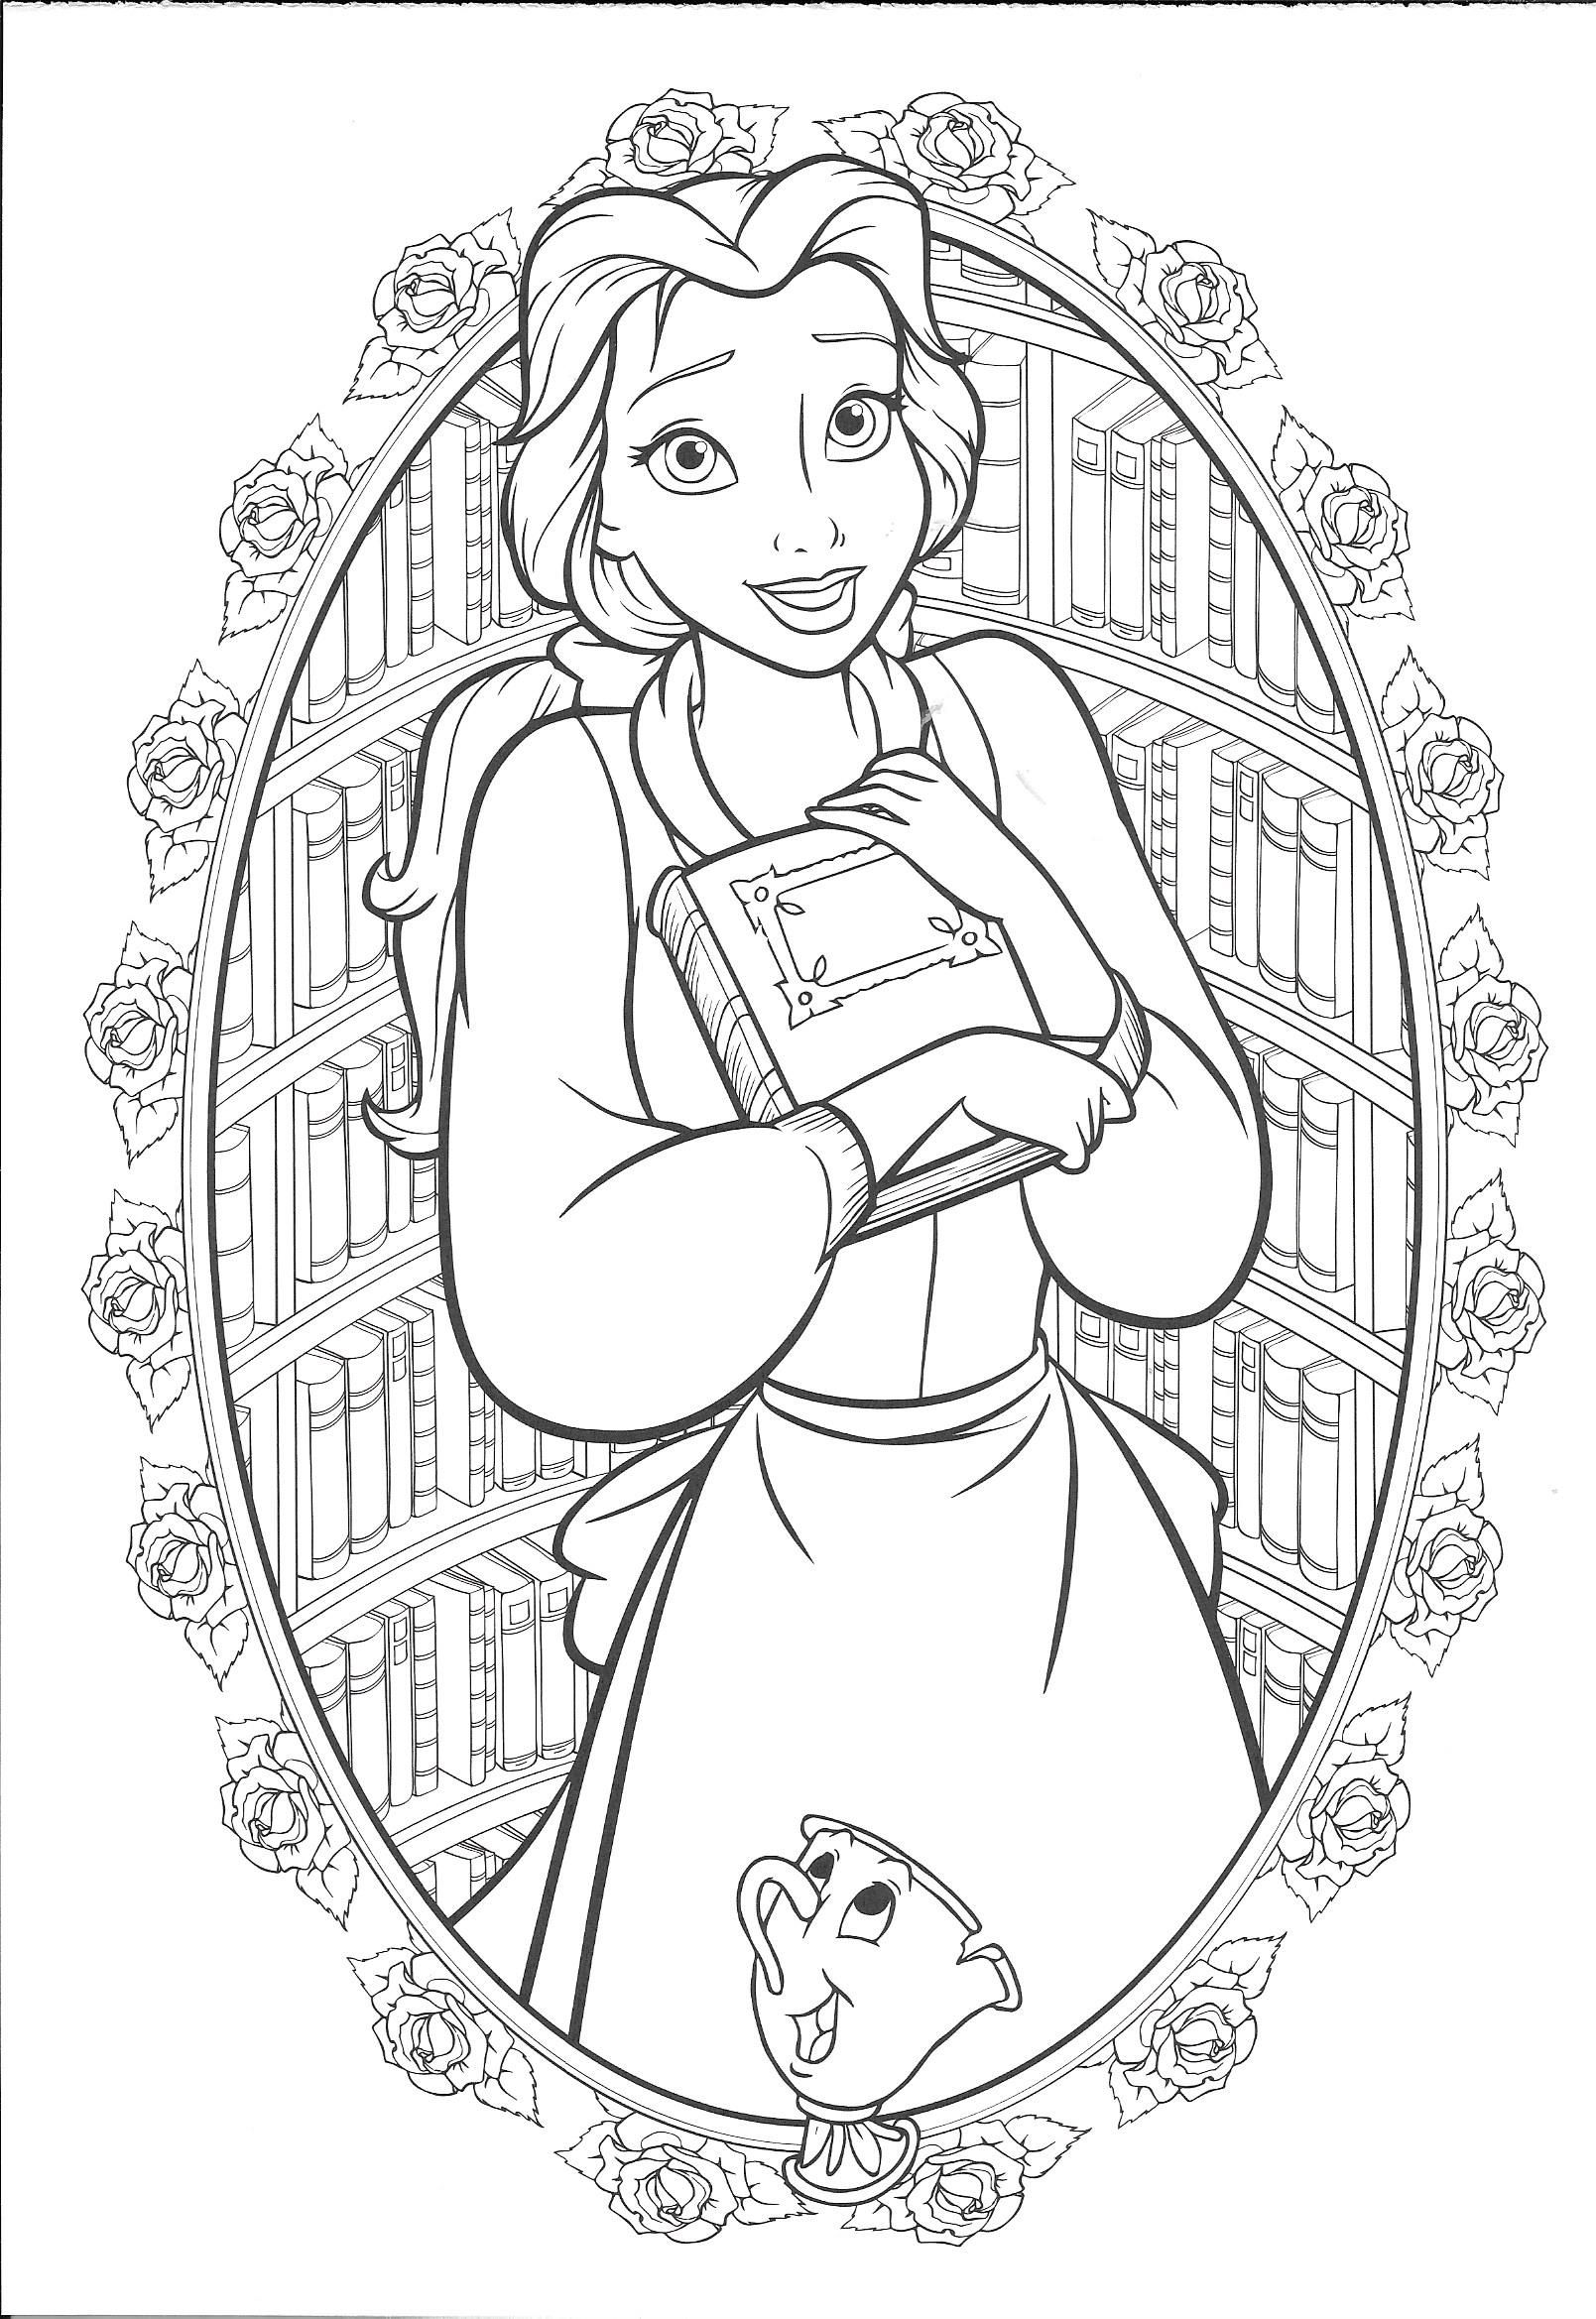 Belle The Bookworm Disney Coloring Pages Belle Coloring Pages Disney Princess Coloring Pages